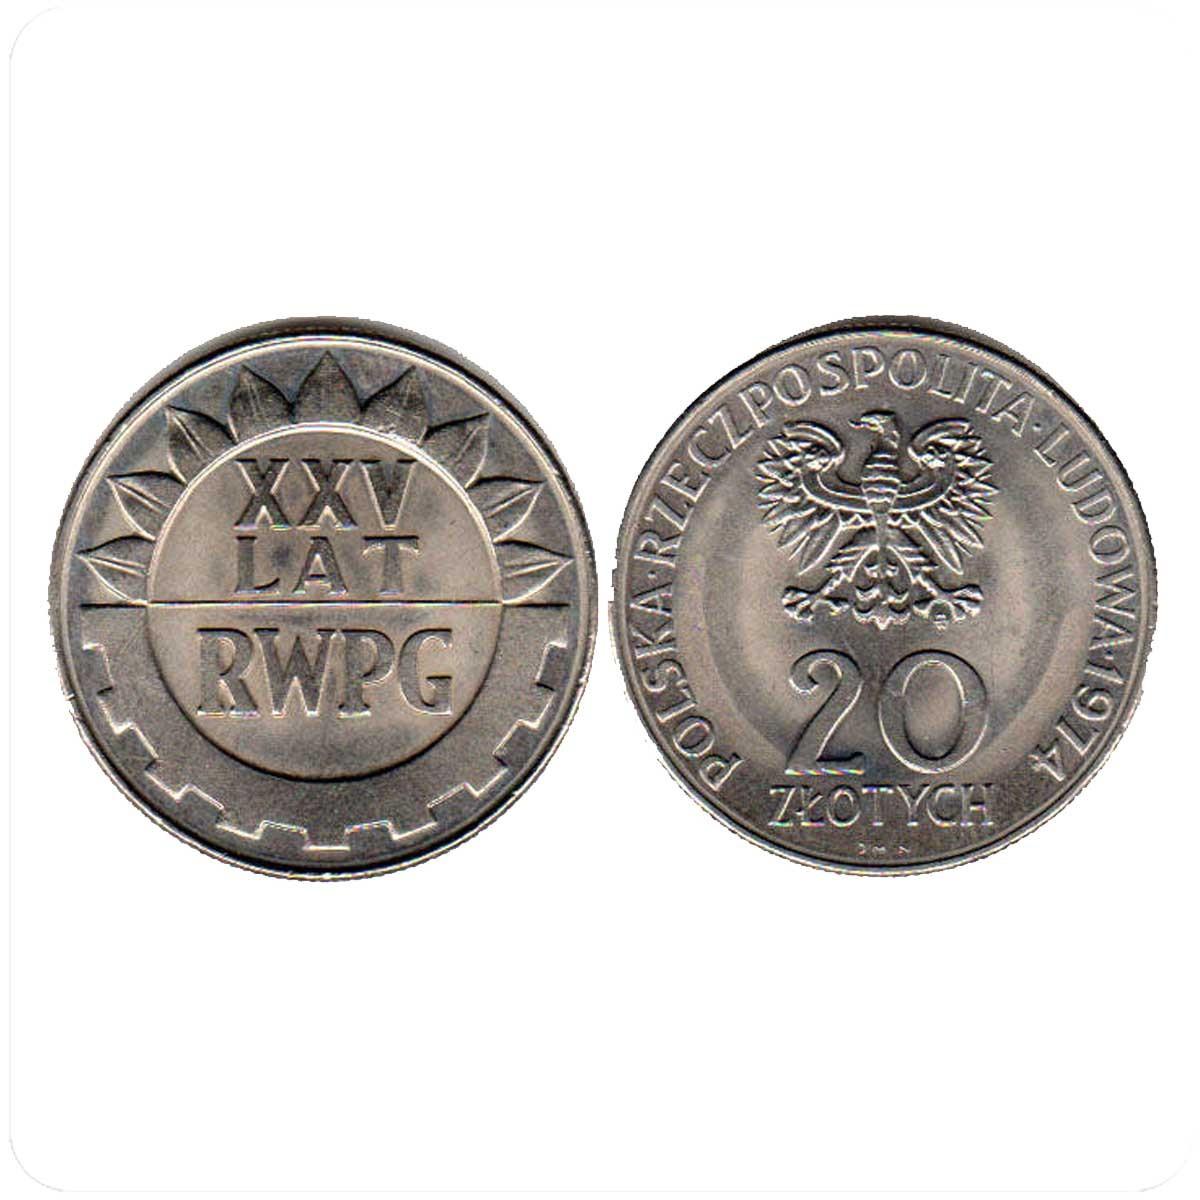 Каталог монет польши регулярного чекана 5лати цена